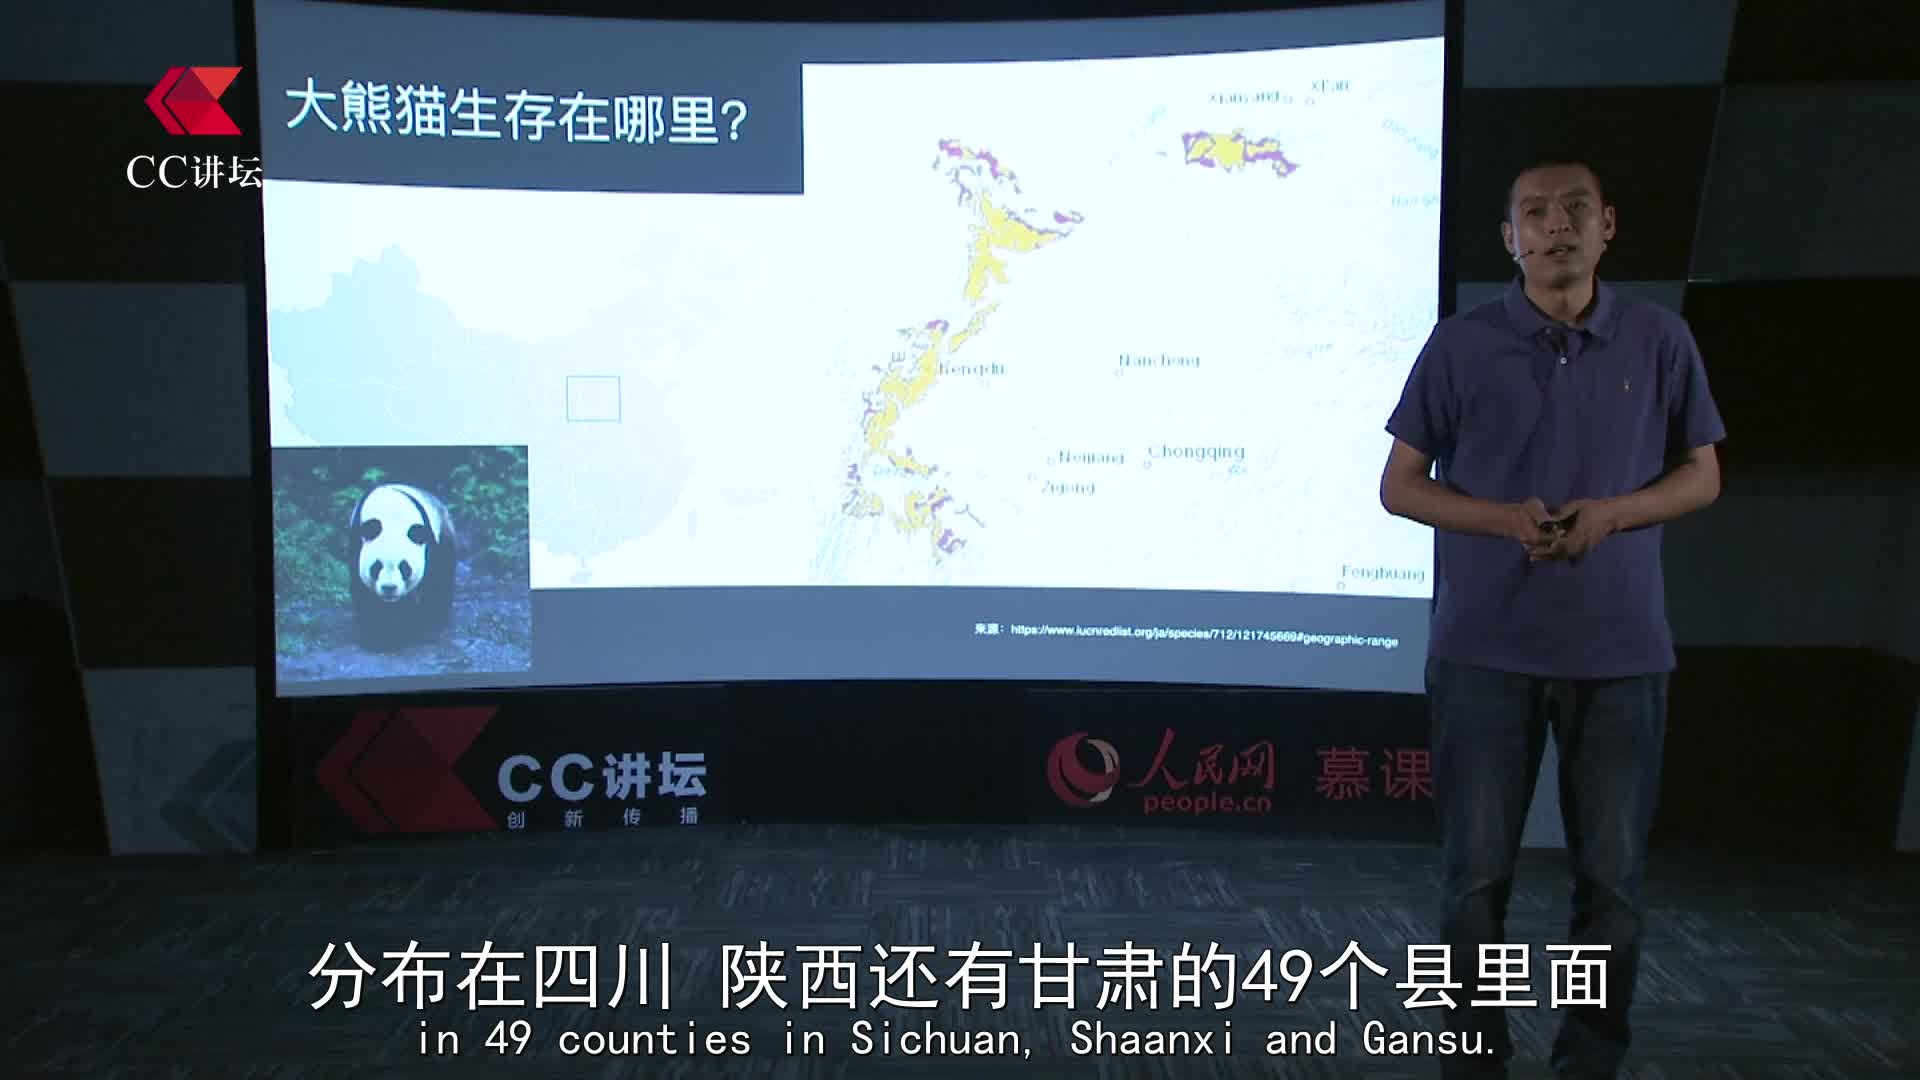 CC讲坛(公益):张玉波《守护大熊猫的小蜜蜂》